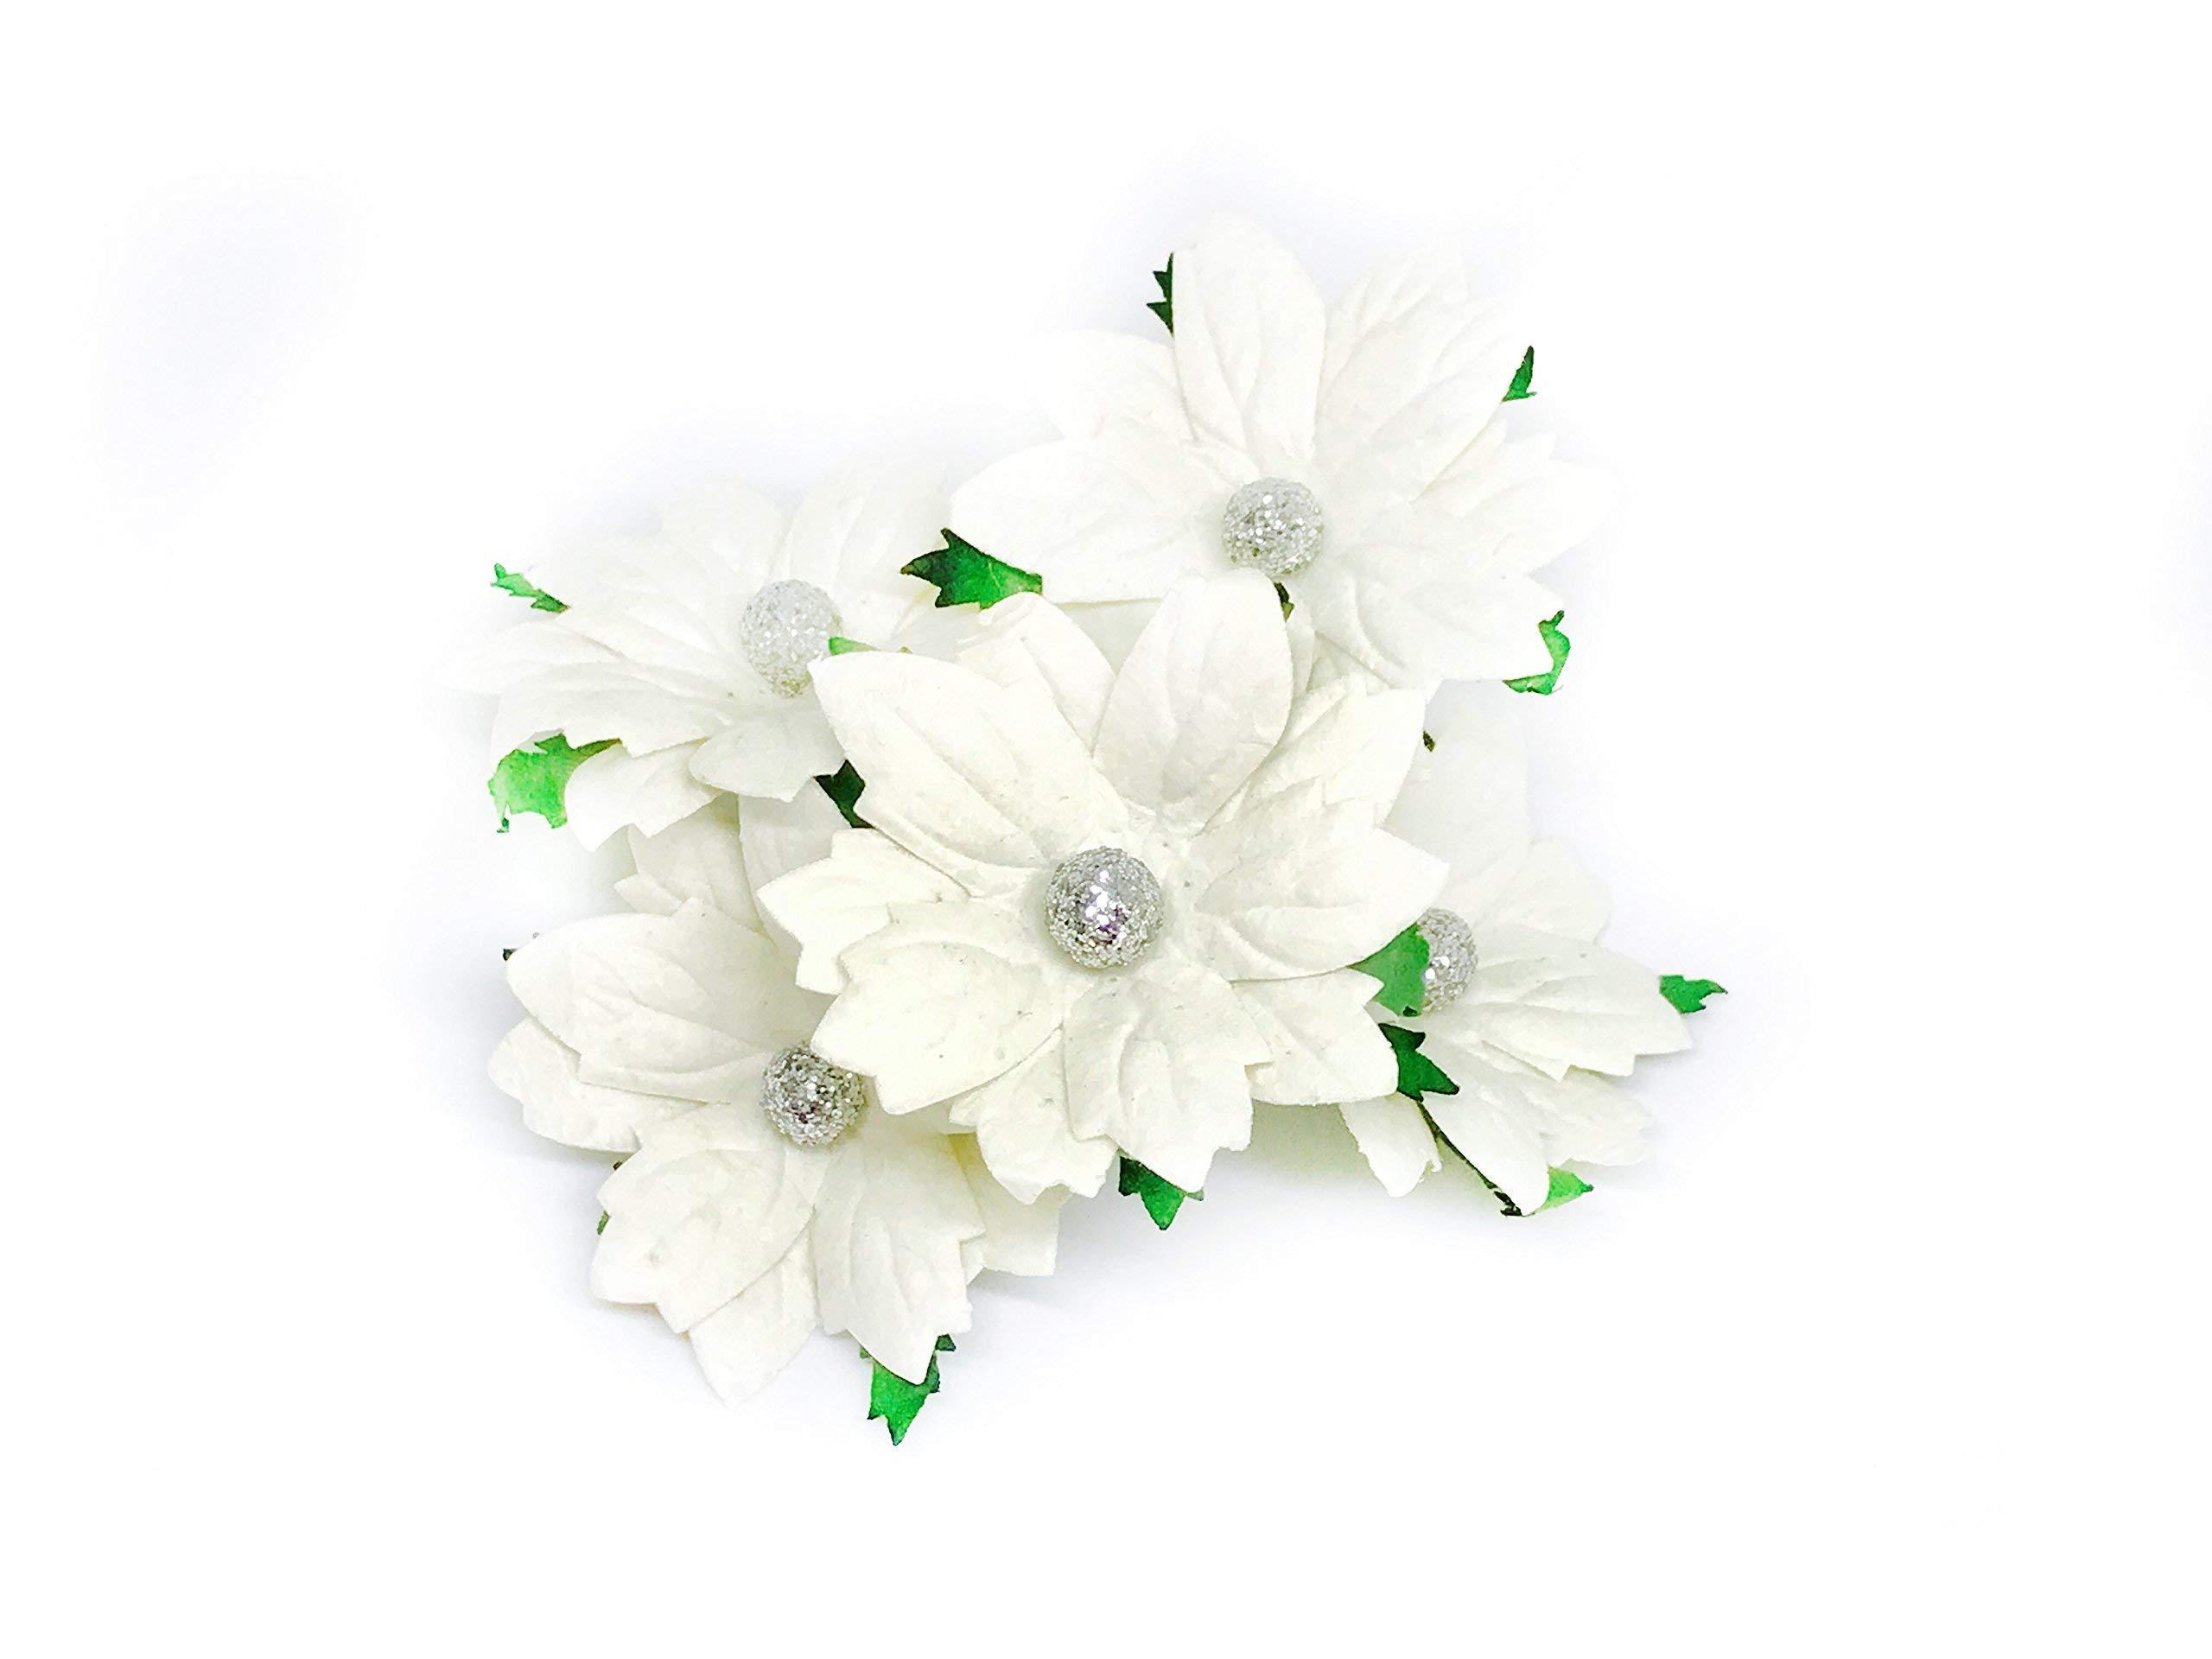 2-White-Poinsettia-Paper-Flowers-Artificial-Poinsettias-Flowers-Paper-Poinsettia-Christmas-Flowers-Fake-Poinsettia-Flowers-Mulberry-Paper-Flowers-10-Pieces